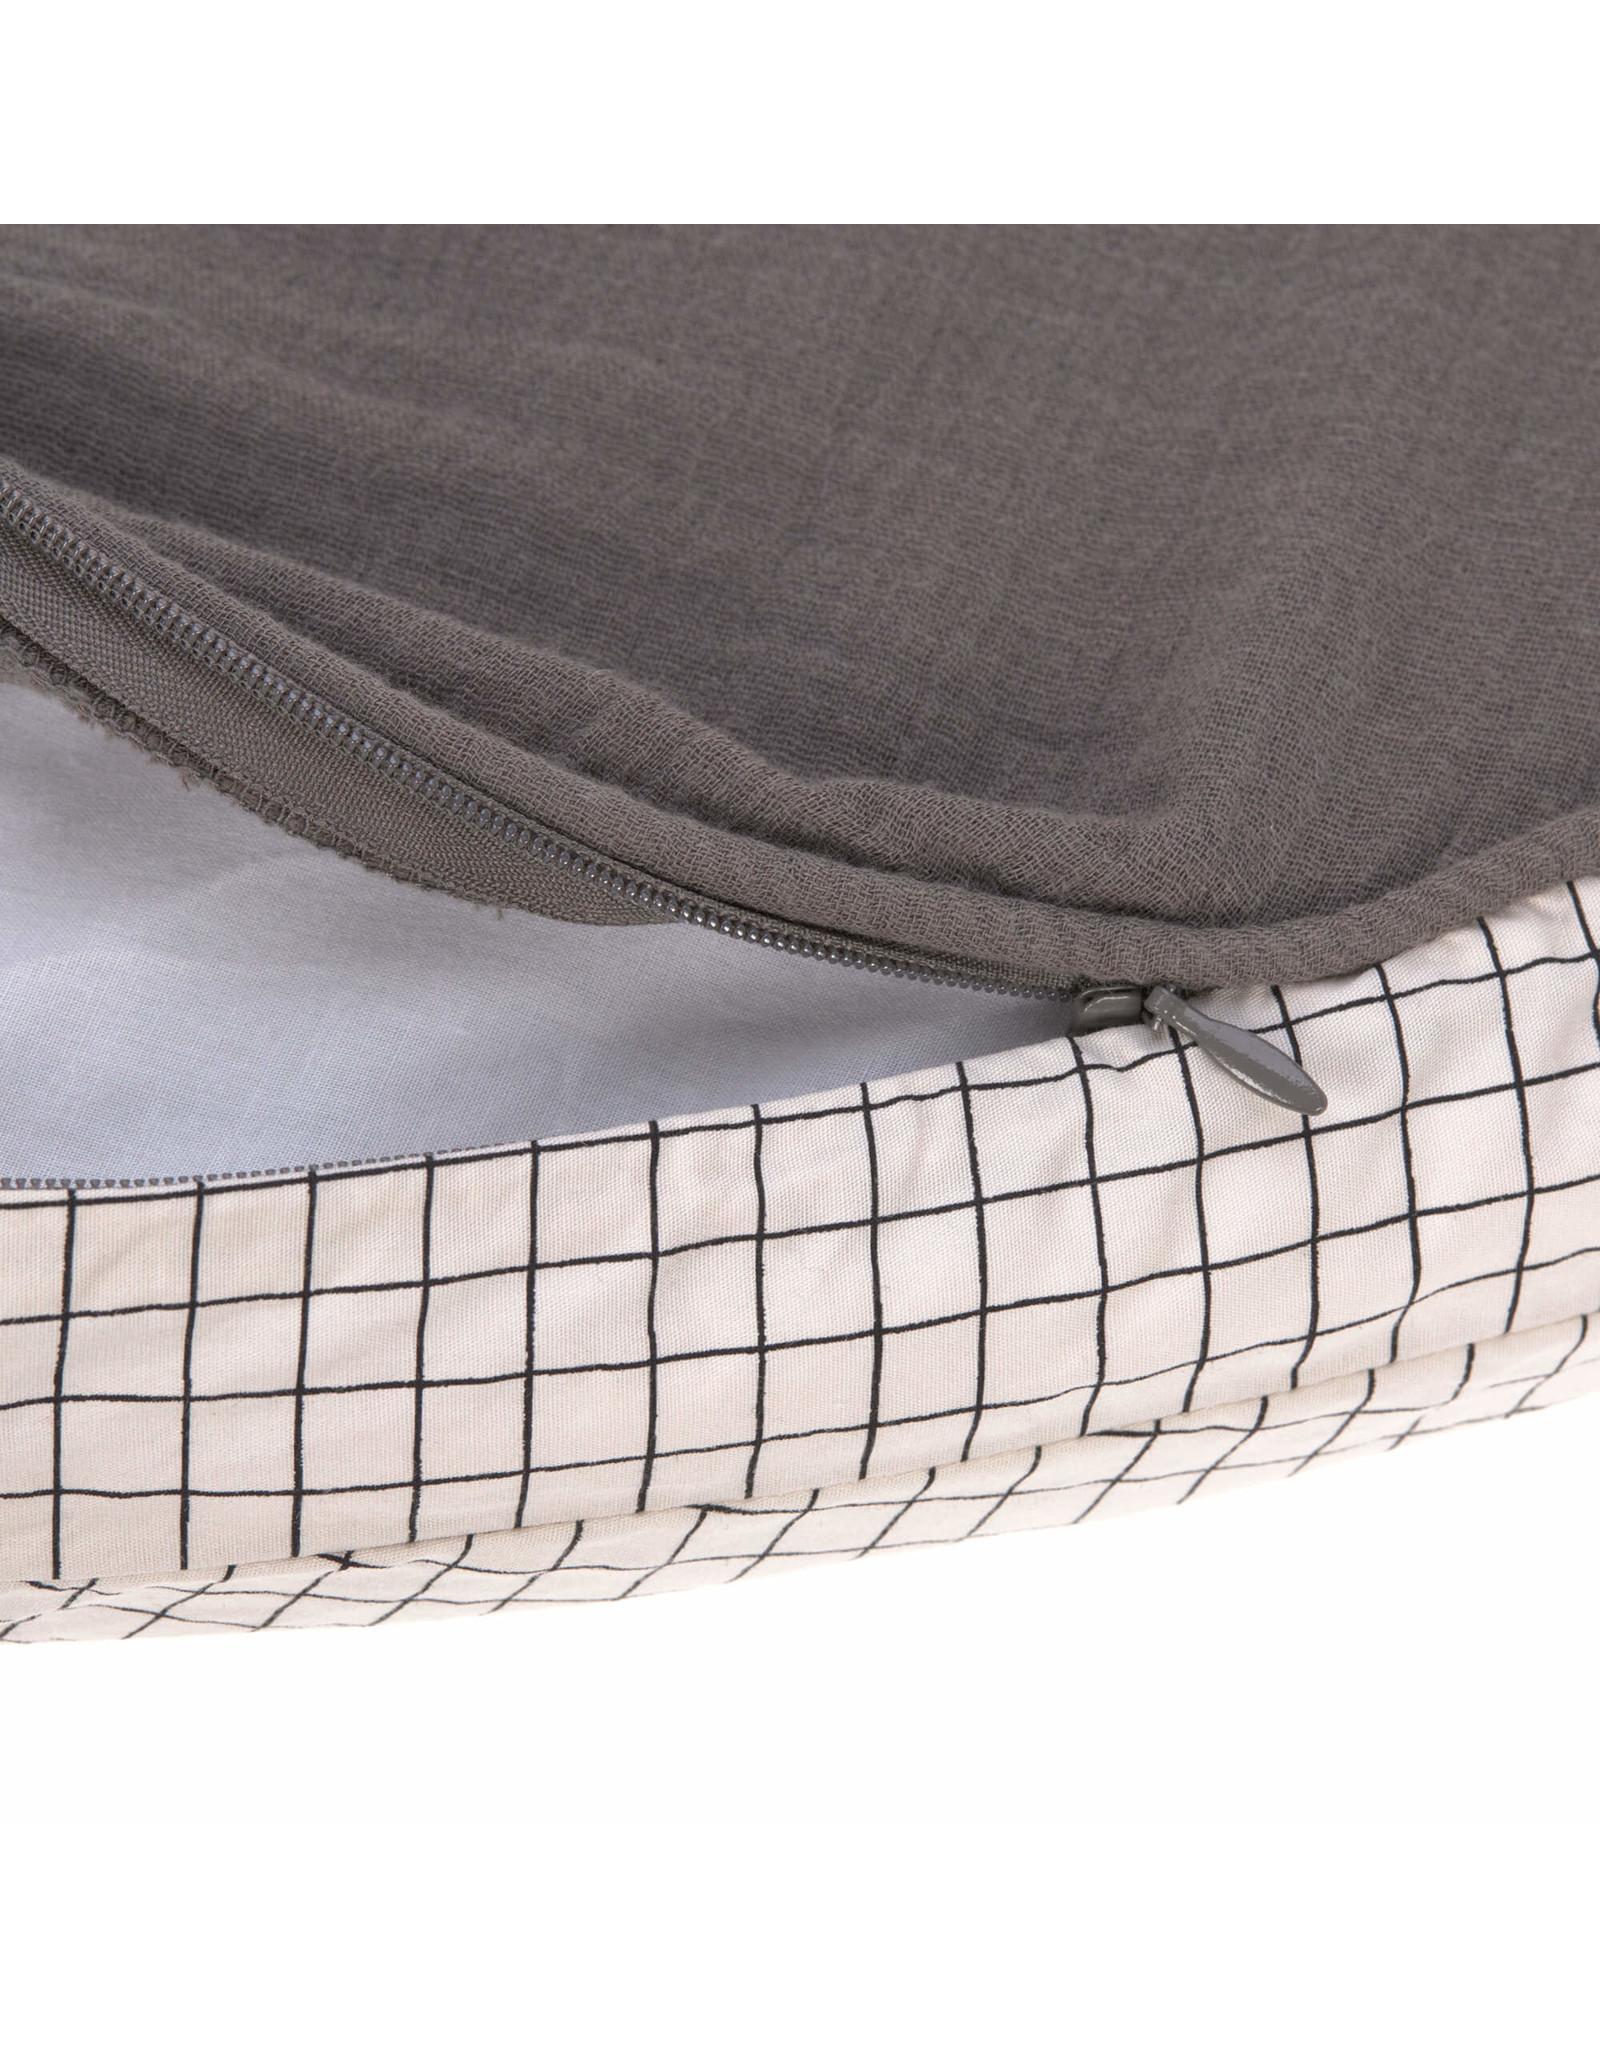 Lassig Lassig Seat Cushion Muslin ø 100 cm Anthracite